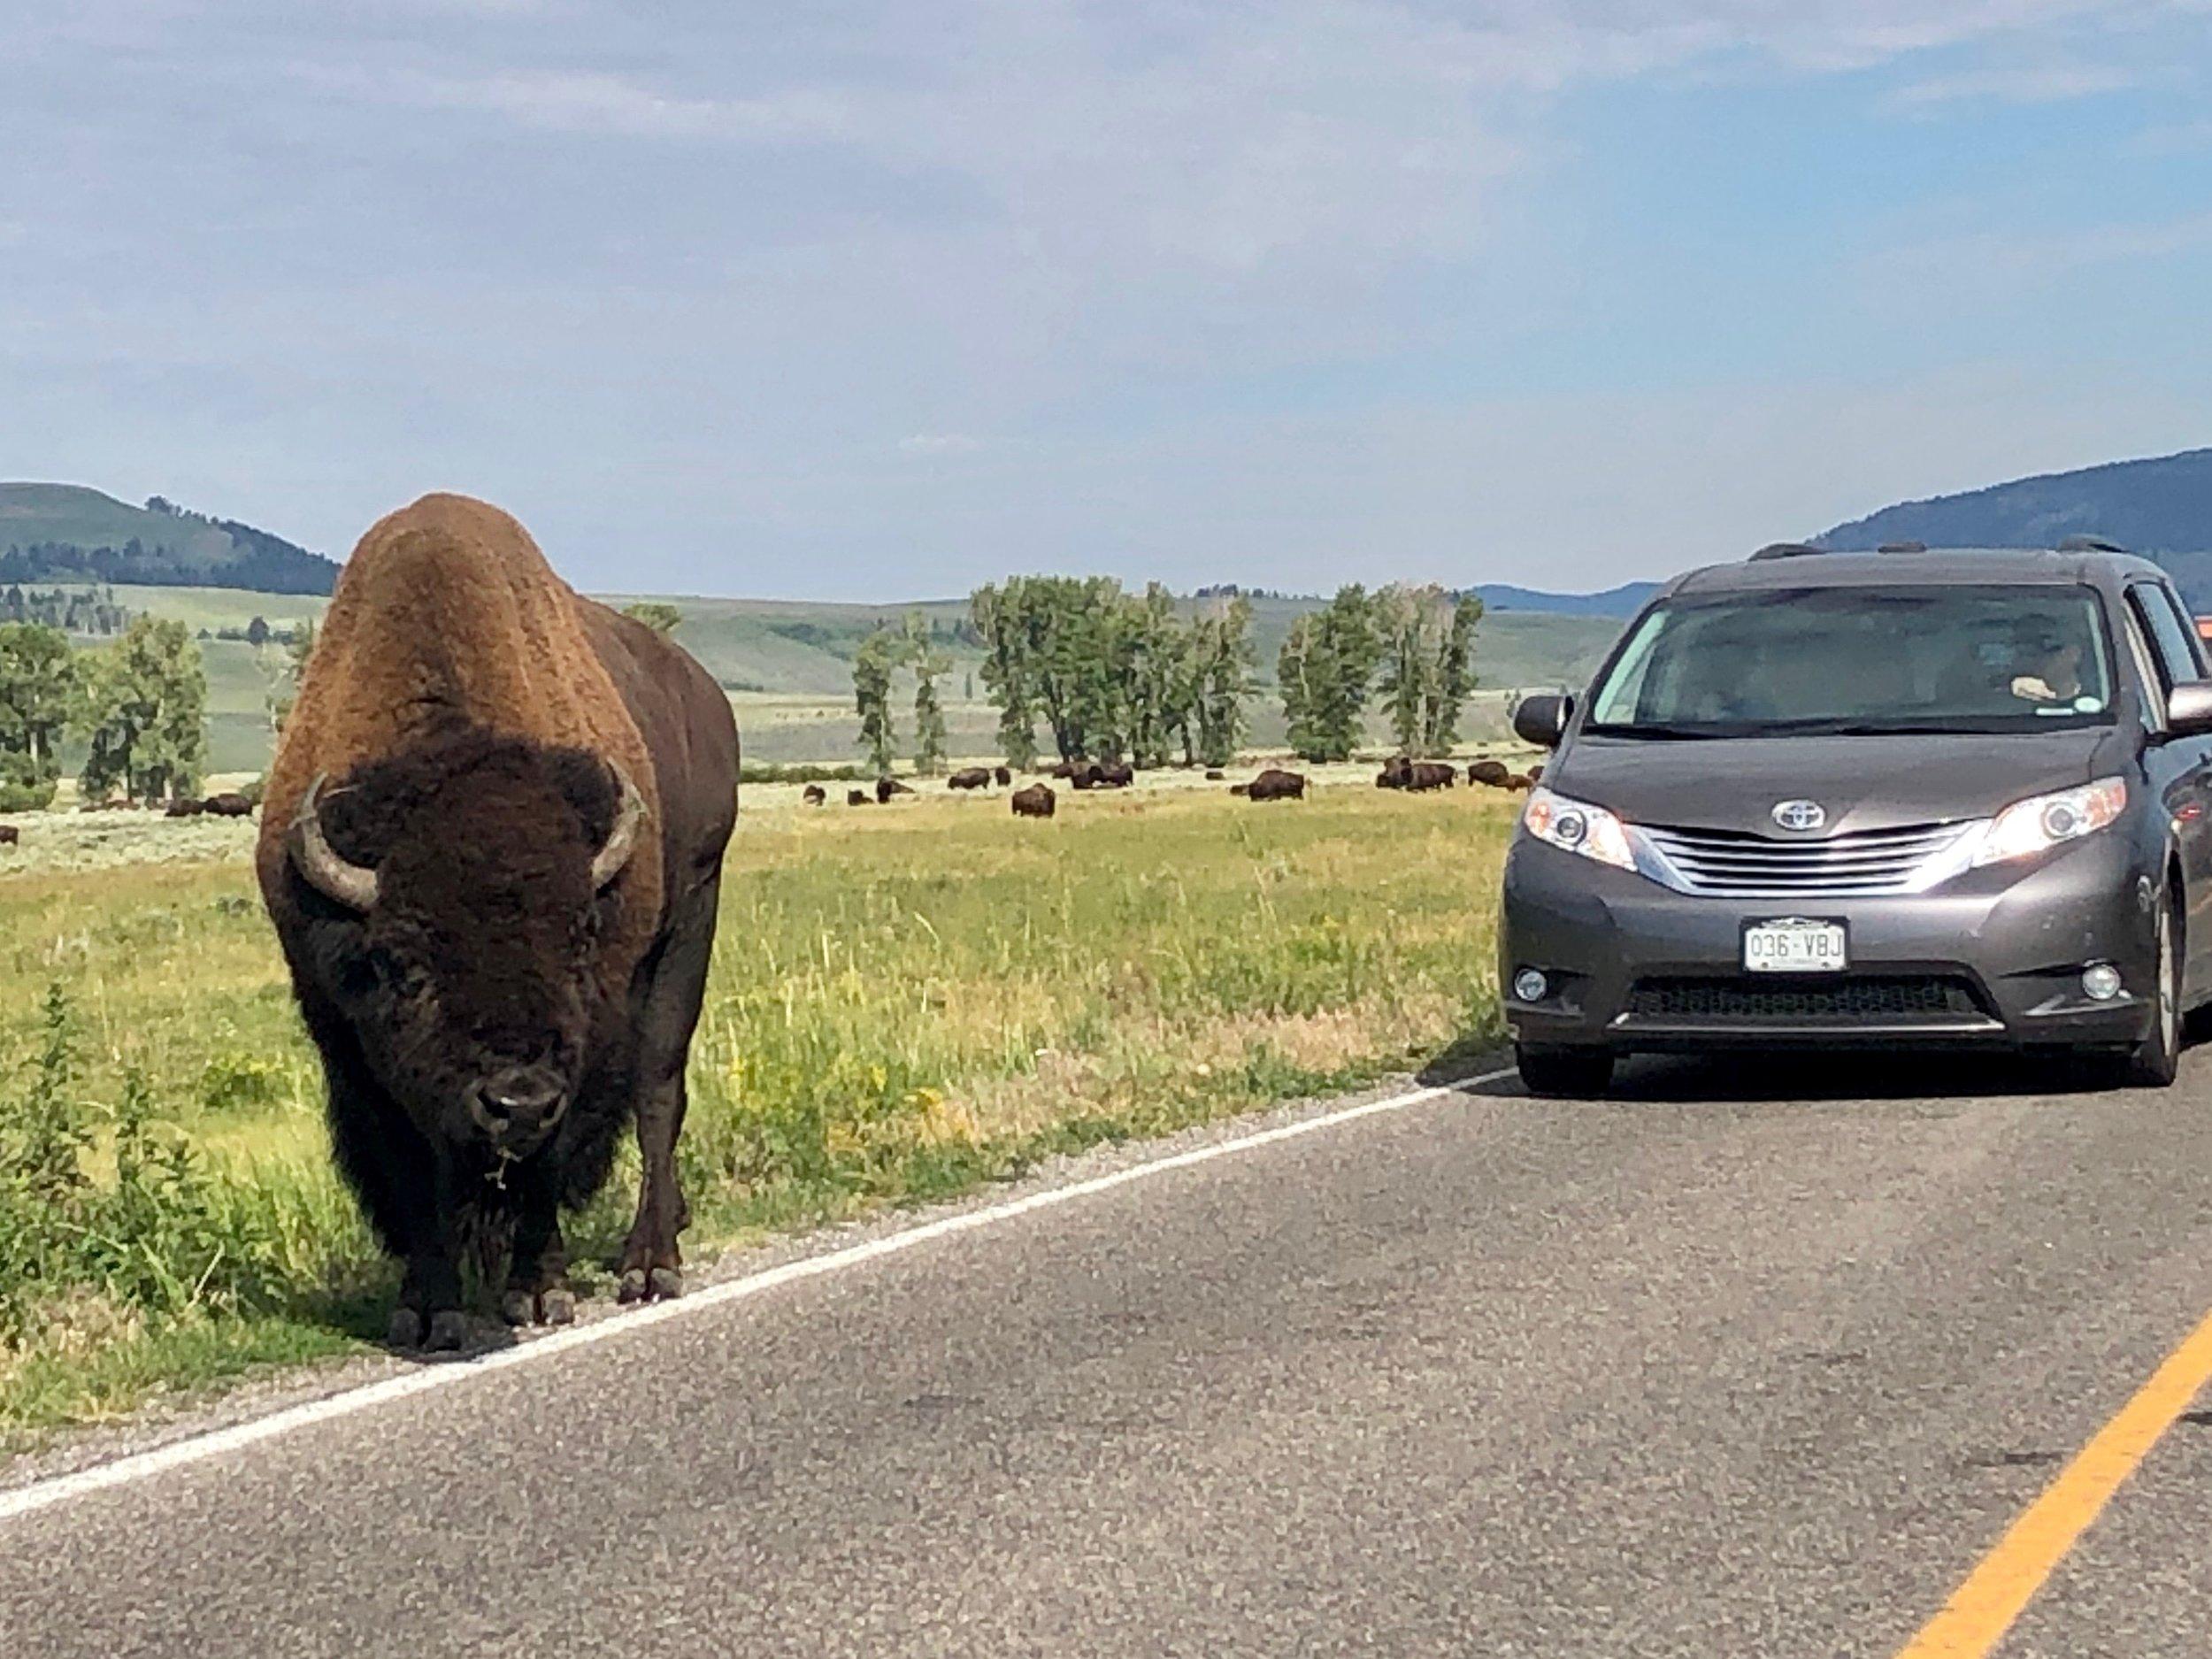 Bison directing traffic